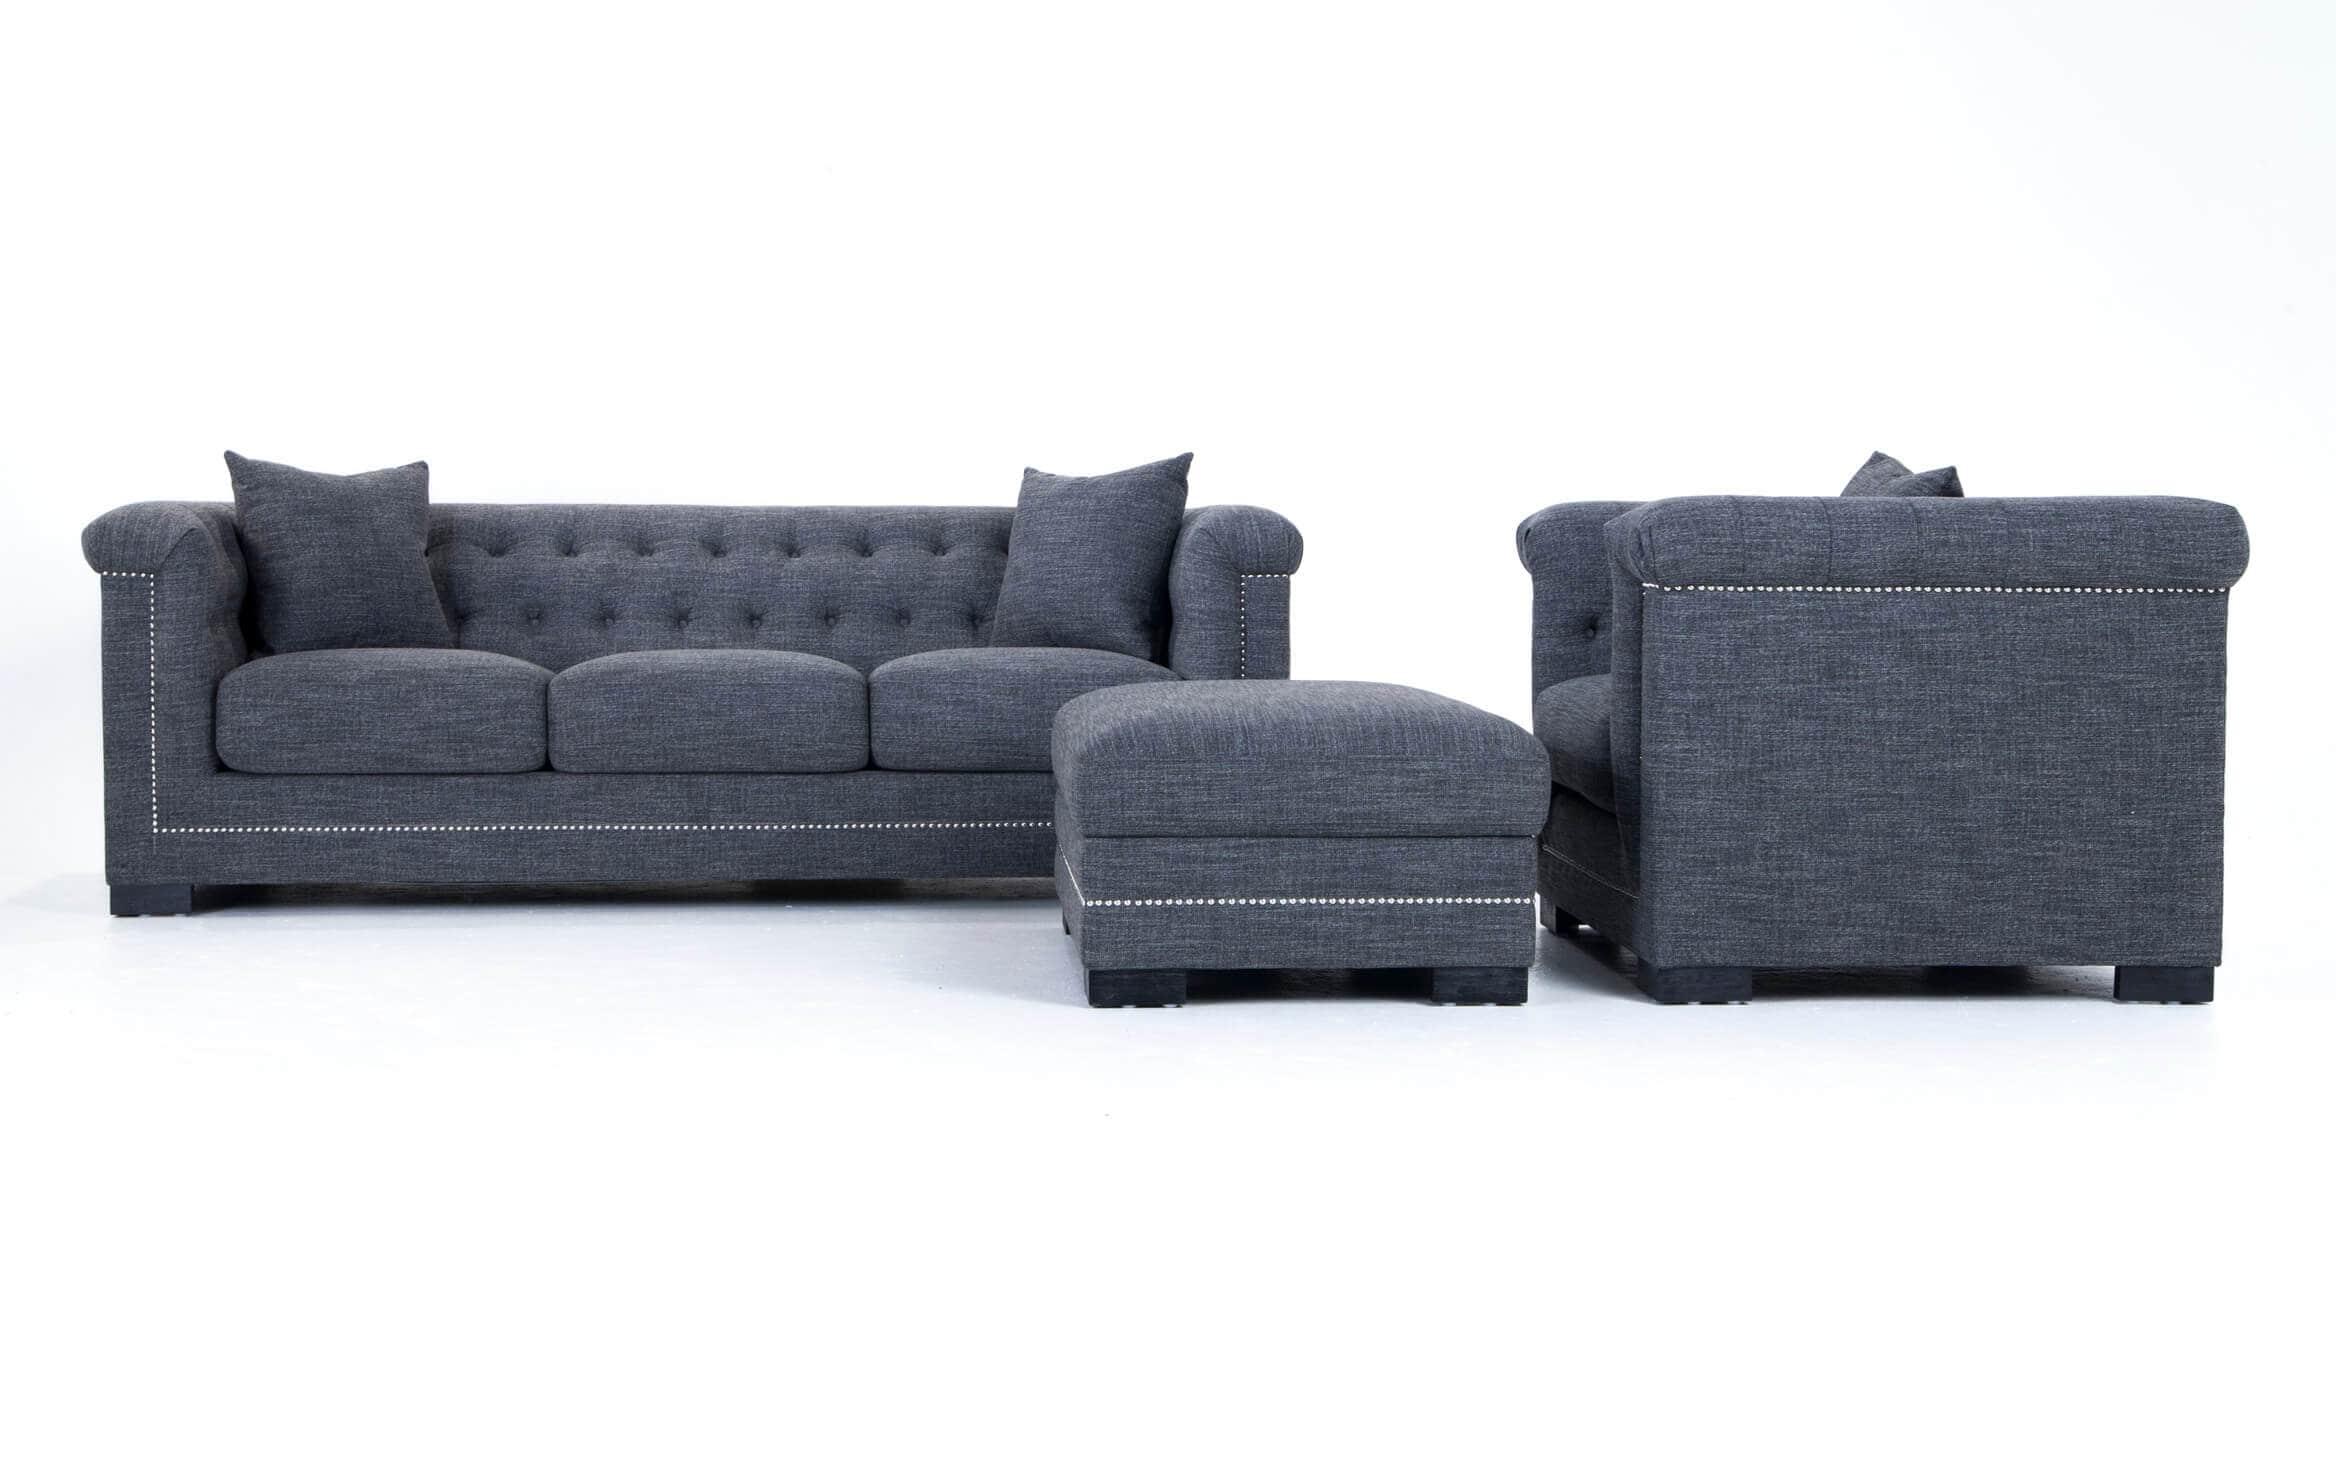 Melrose Sofa Chair Storage Ottoman